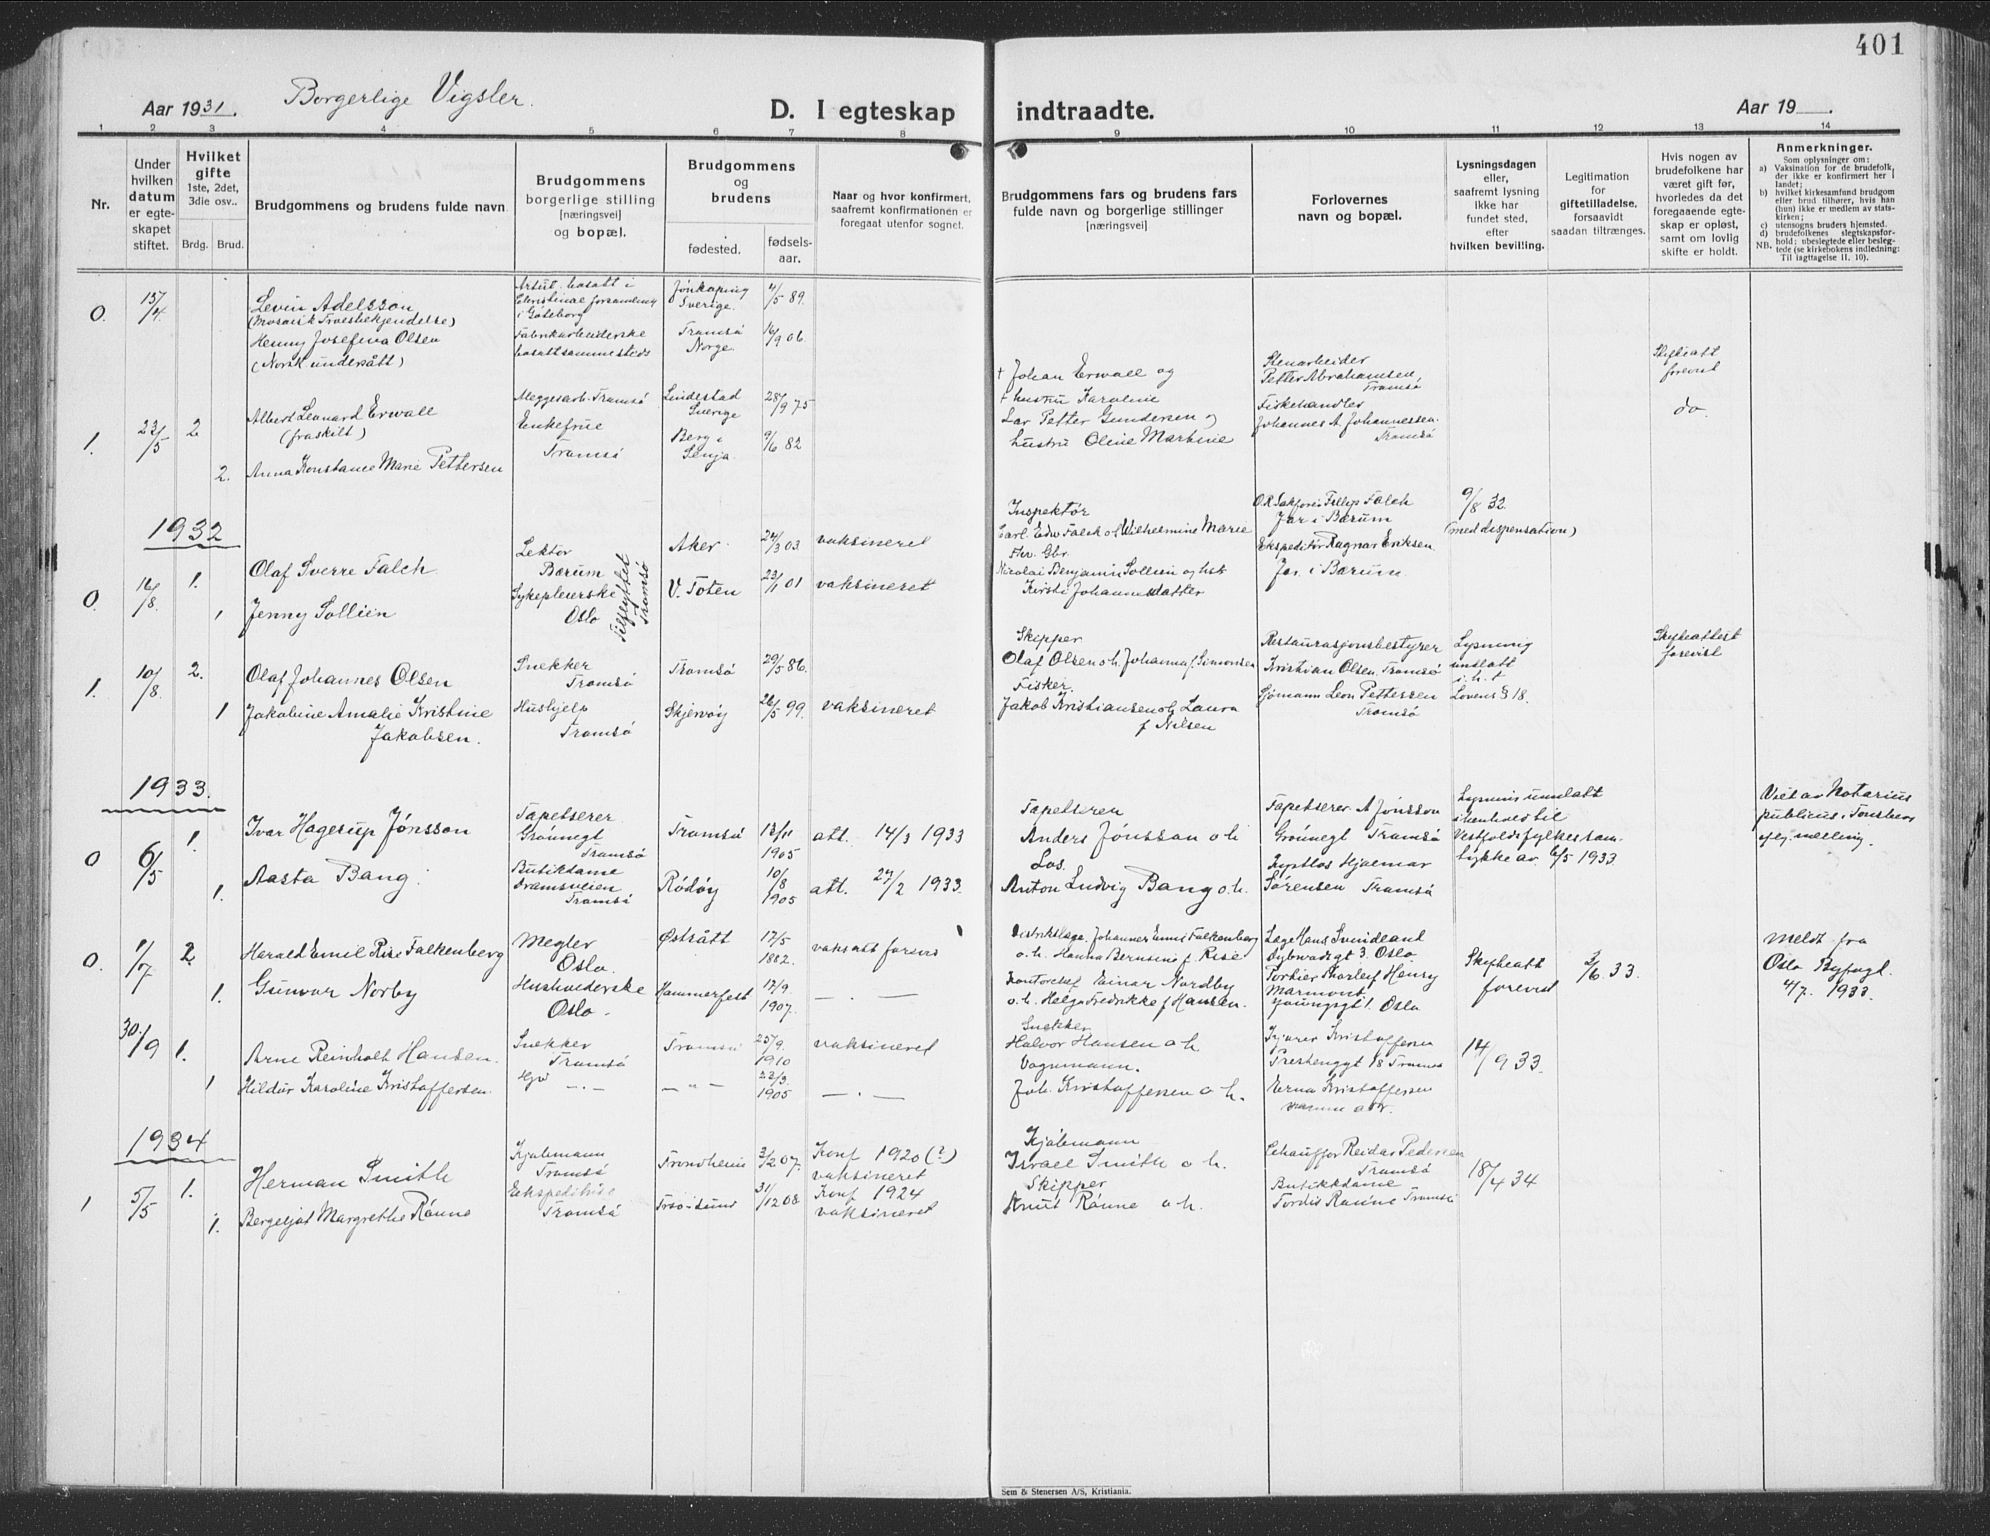 SATØ, Tromsø sokneprestkontor/stiftsprosti/domprosti, G/Gb/L0010klokker: Klokkerbok nr. 10, 1925-1937, s. 401